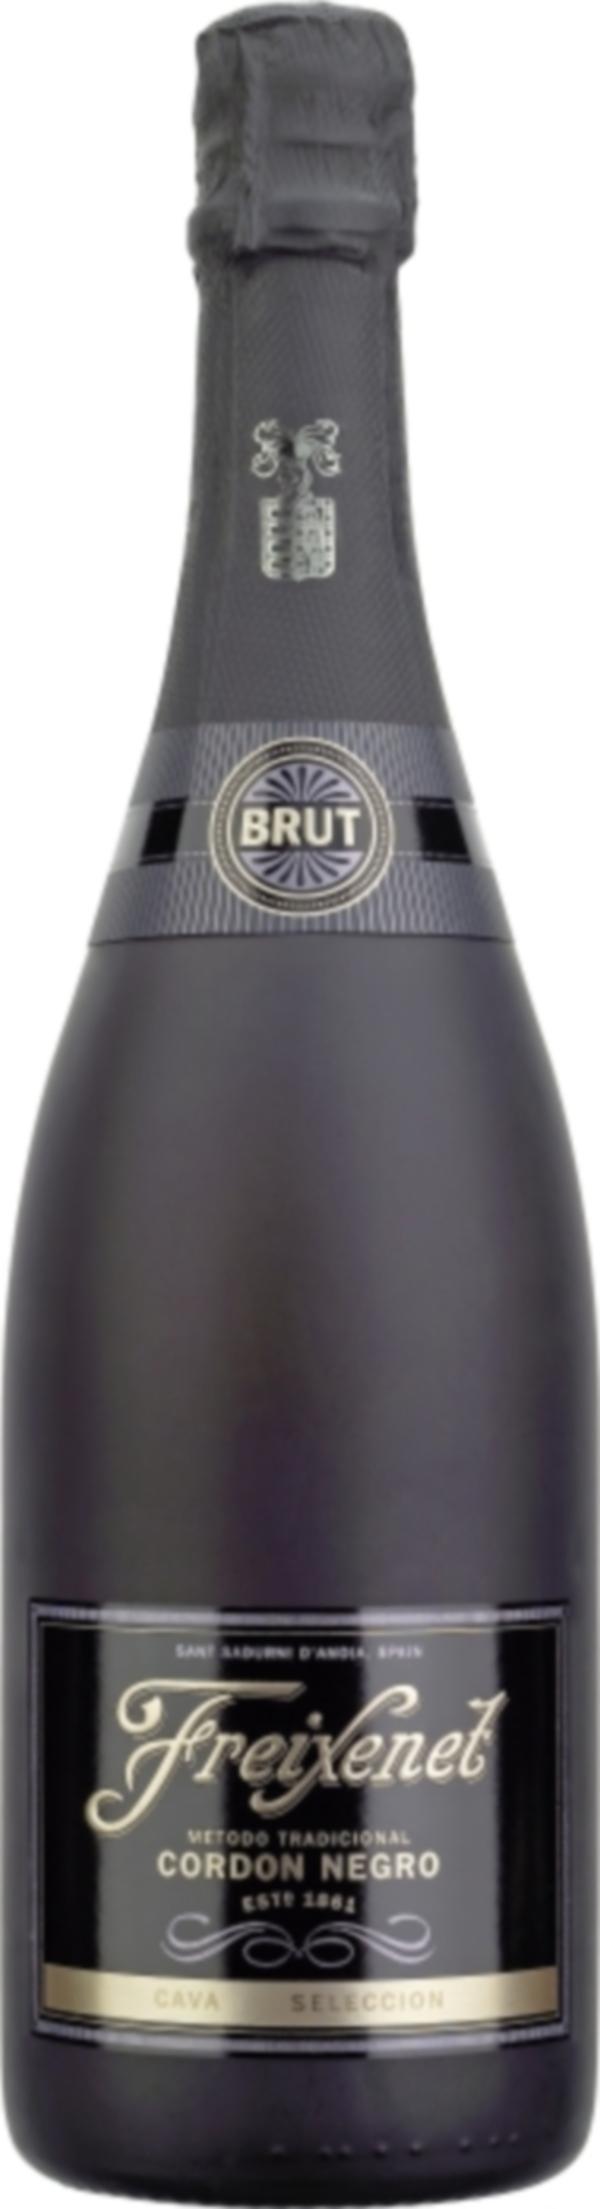 Freixenet Cava Cordon Negro Brut 0,75 ltr